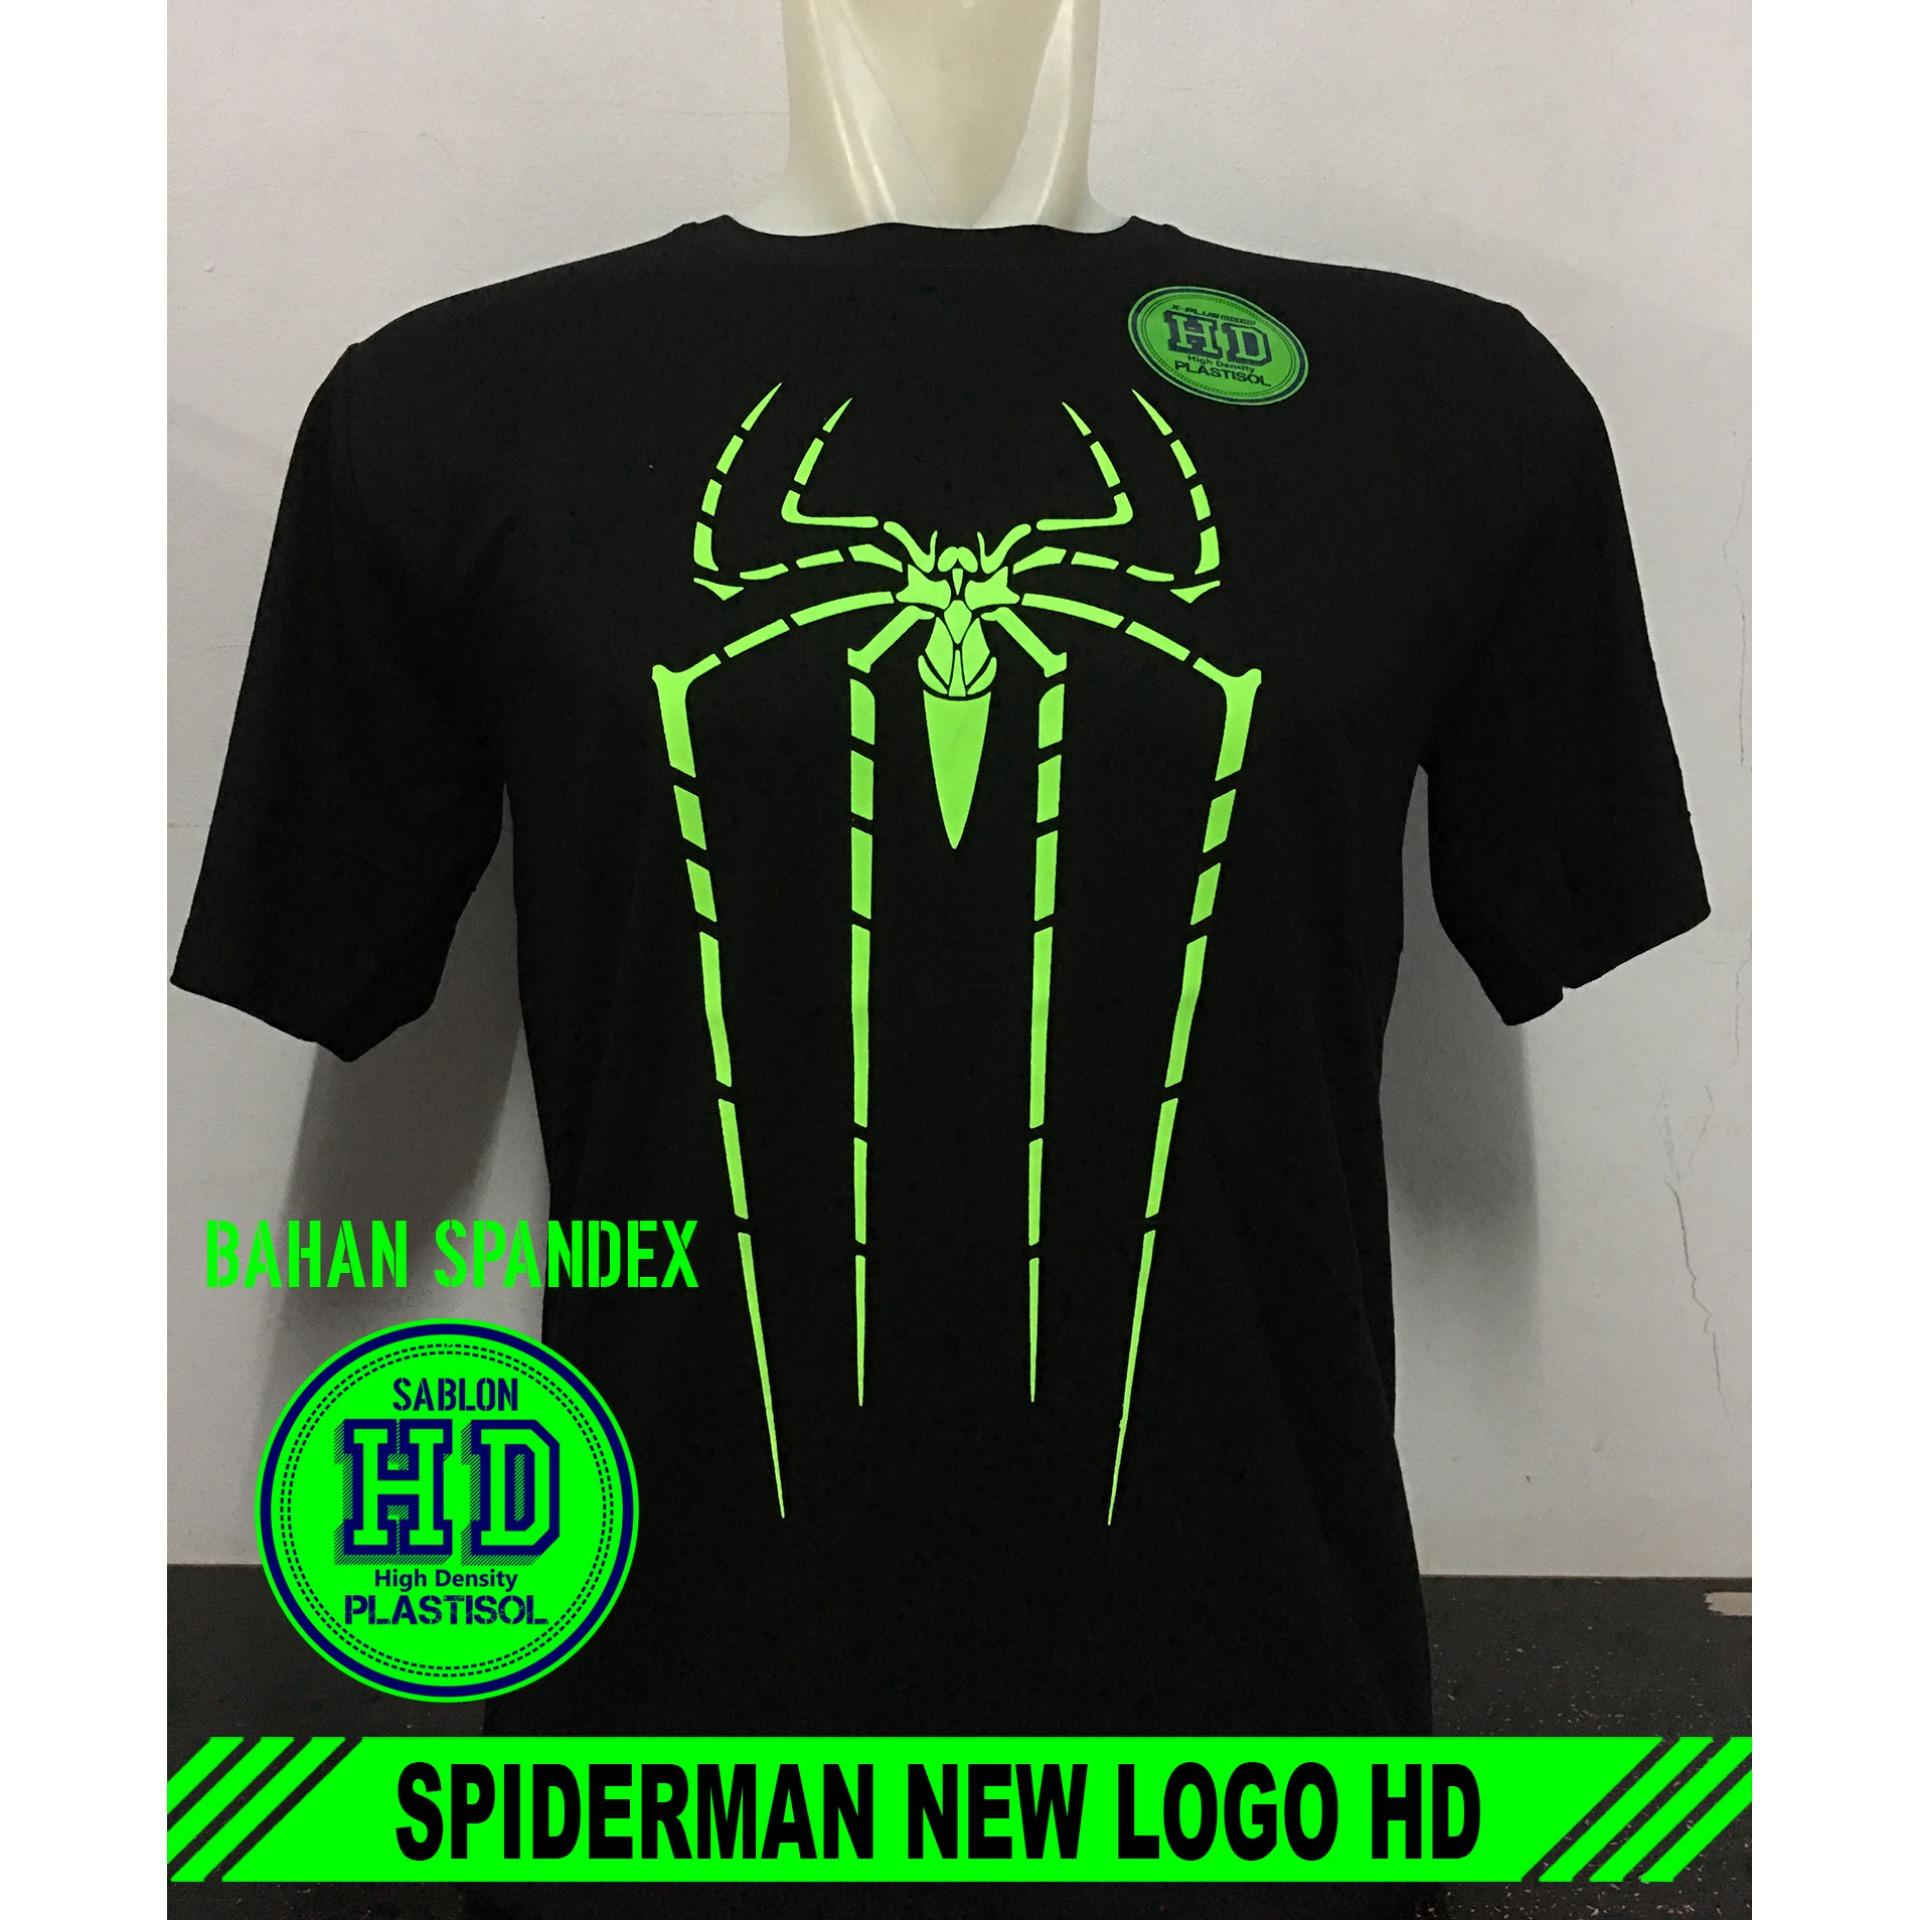 Anime ID - Kaos T-Shirt Distro / kaos Pria / Tshirt Pria / Distro Pria / Baju Pria Superhero HD Spi